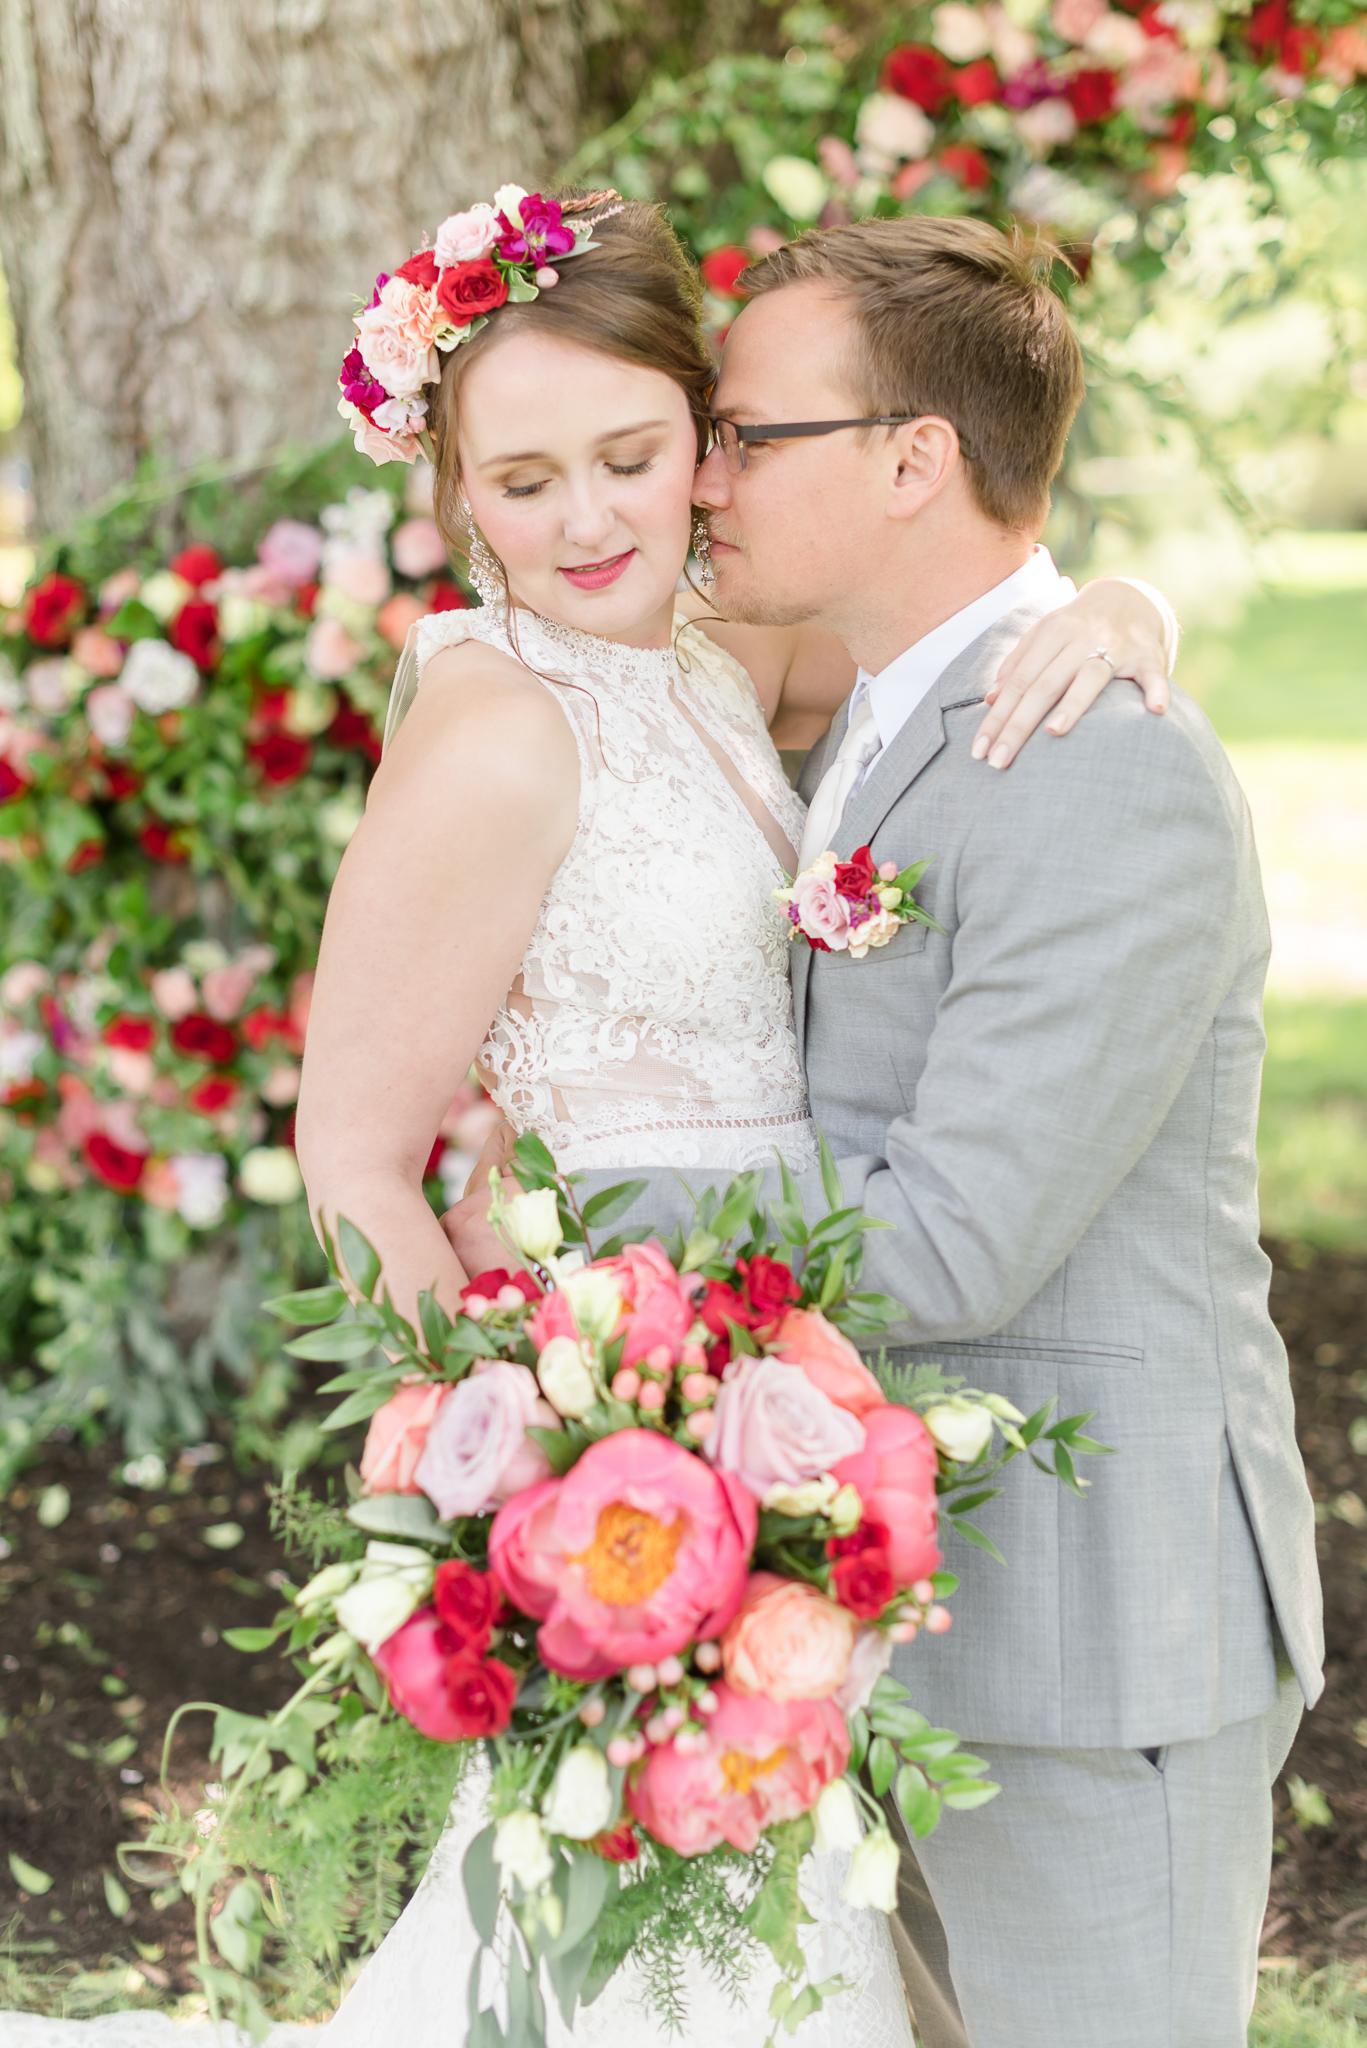 Mustard Seed Gardens Wedding Indianapolis Noblesvile Fishers Wedding Photographer-30.jpg